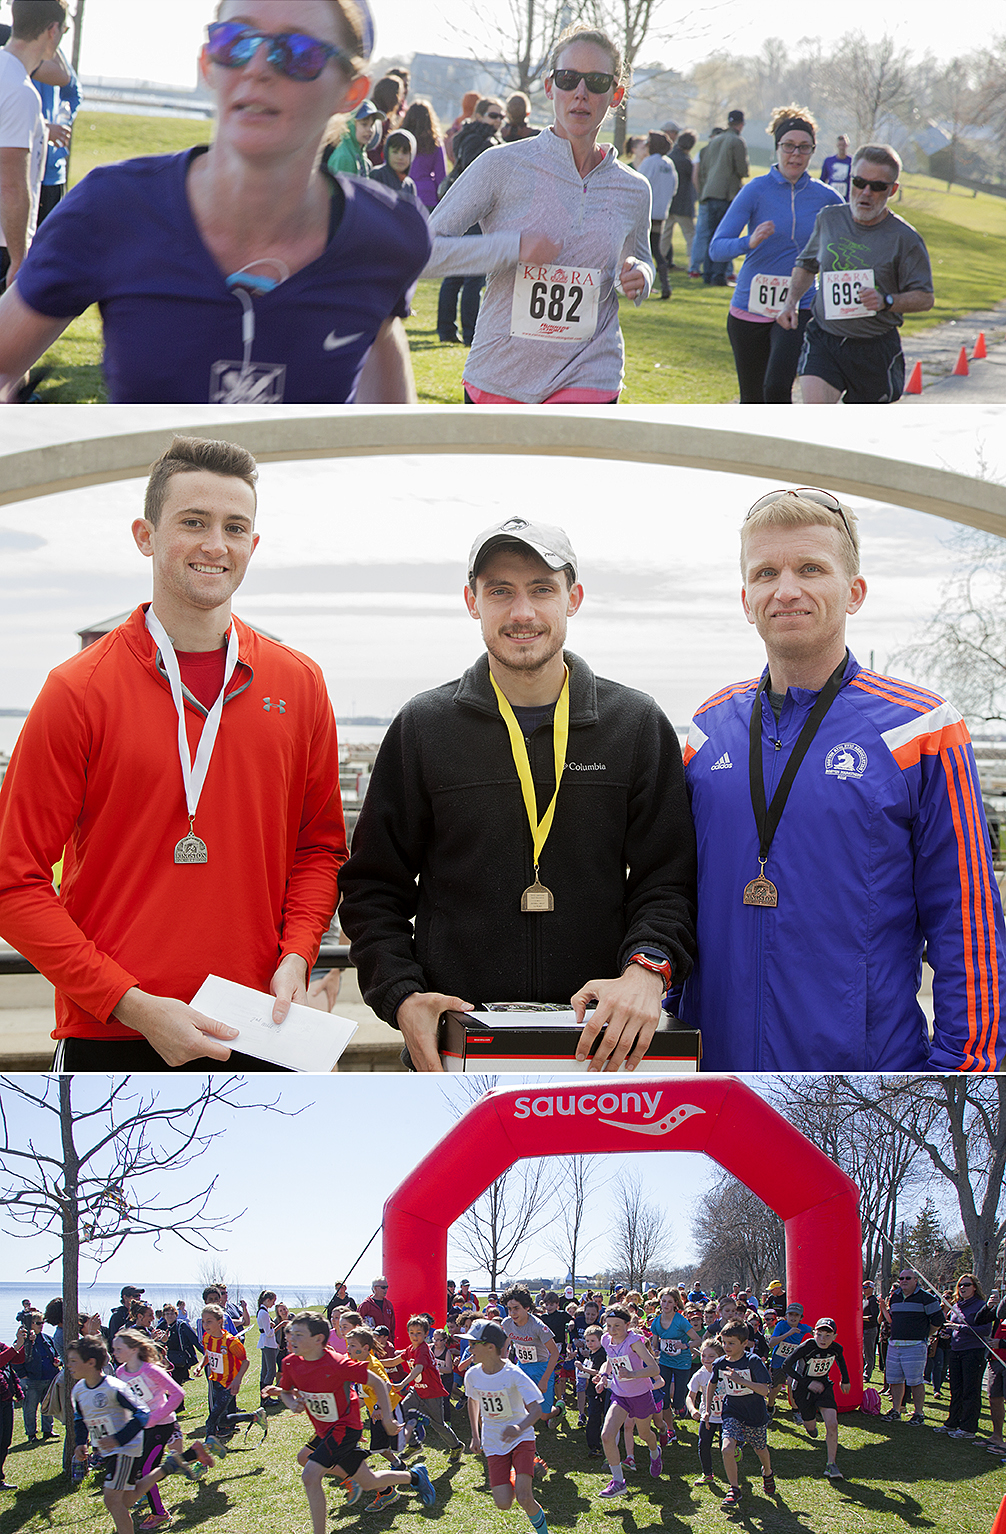 Top: finishers of the KGH Trauma 10 Run. Middle: Half marathon top three male finishers. Bottom: Kids 2K Race start.